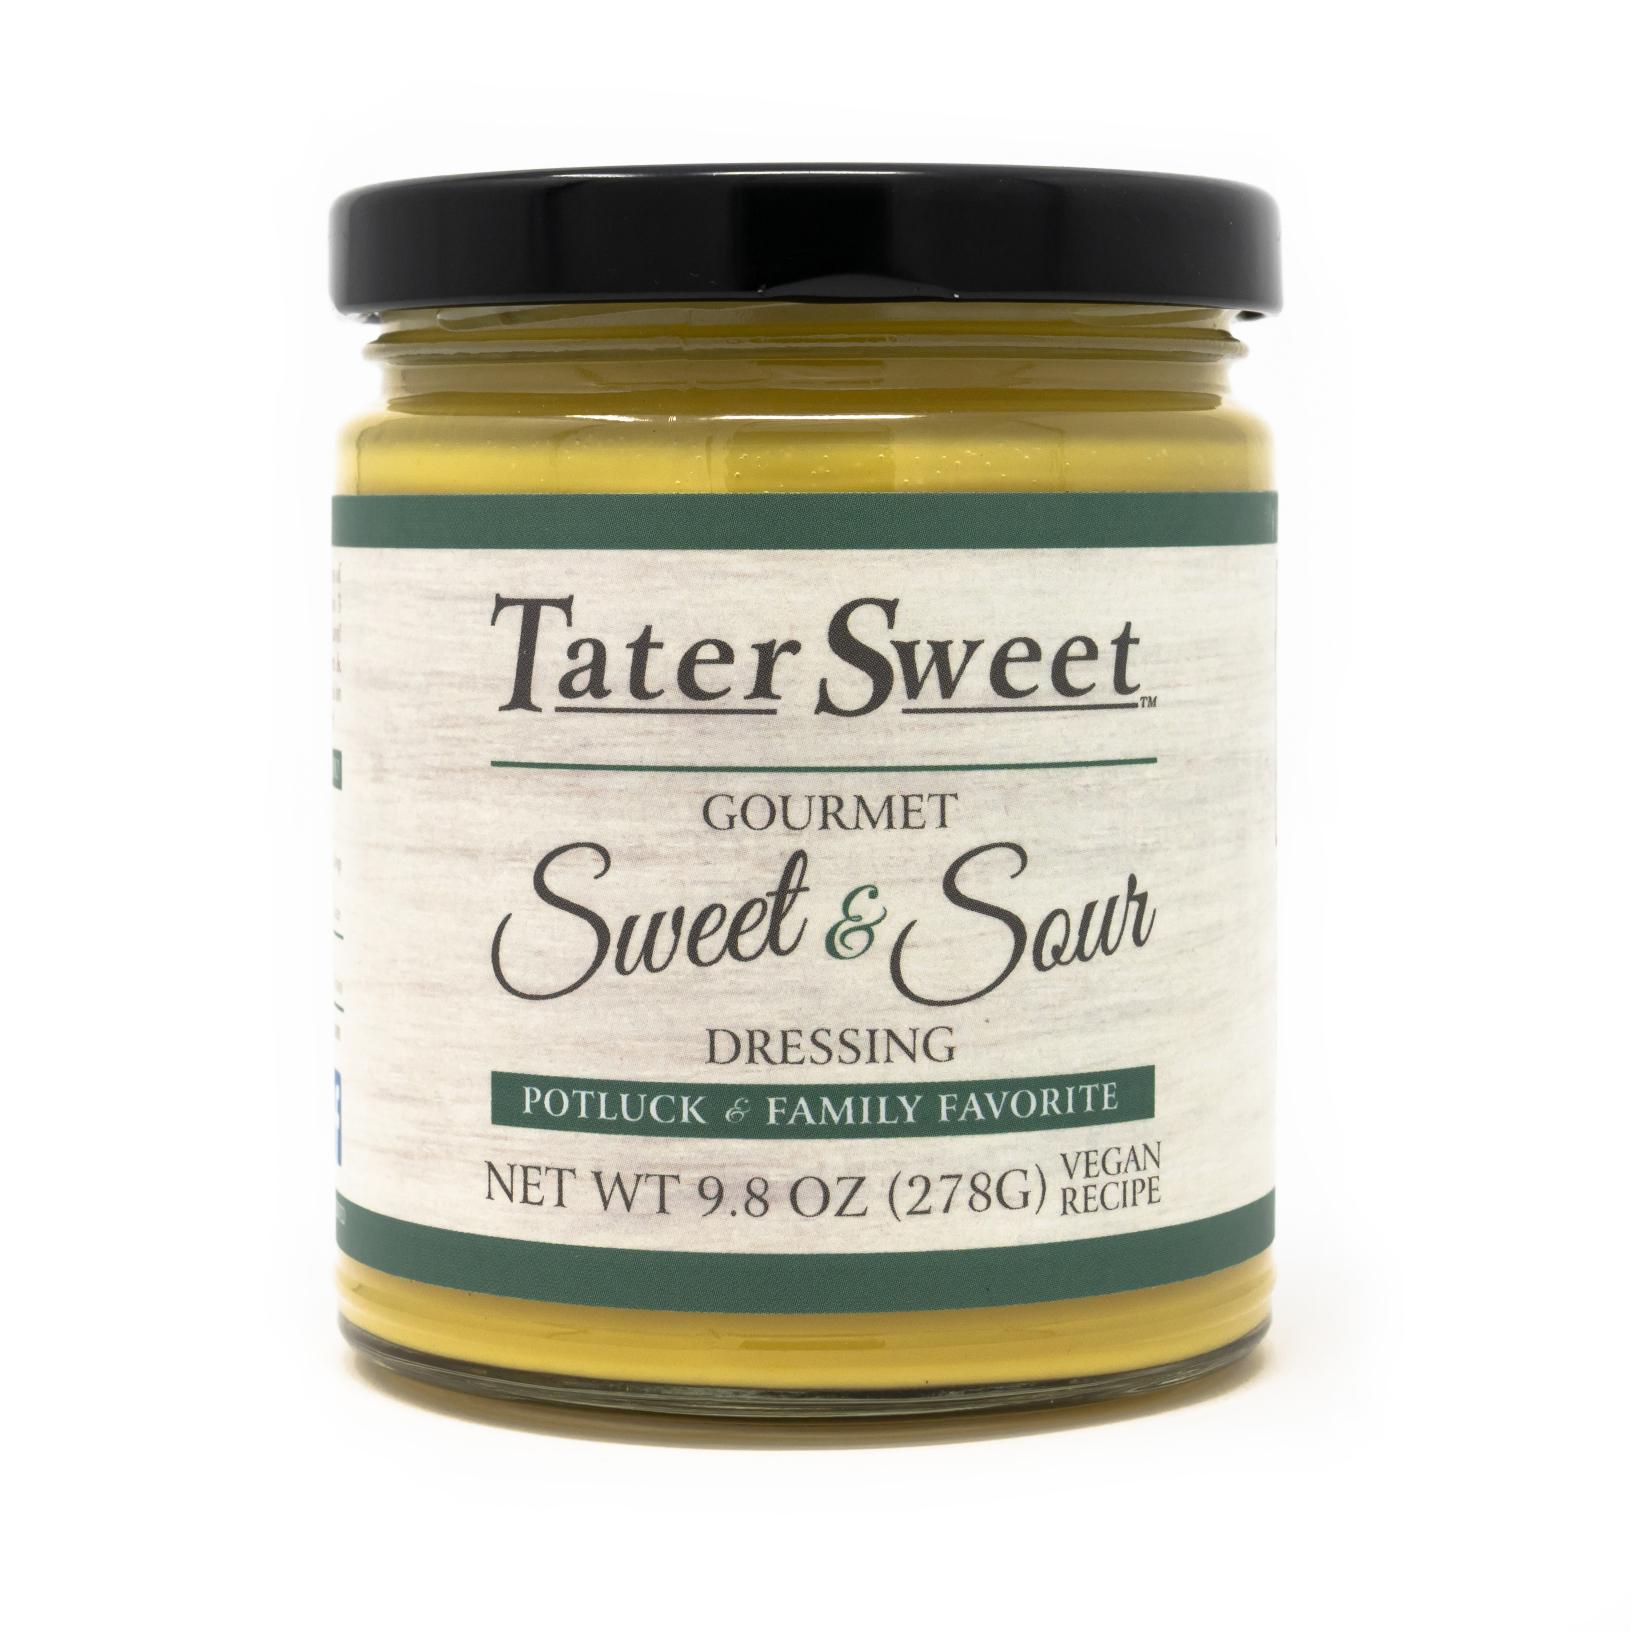 1 glass jar filled with TaterSweet Sweet & Sour Gourmet Dressing - Vegan